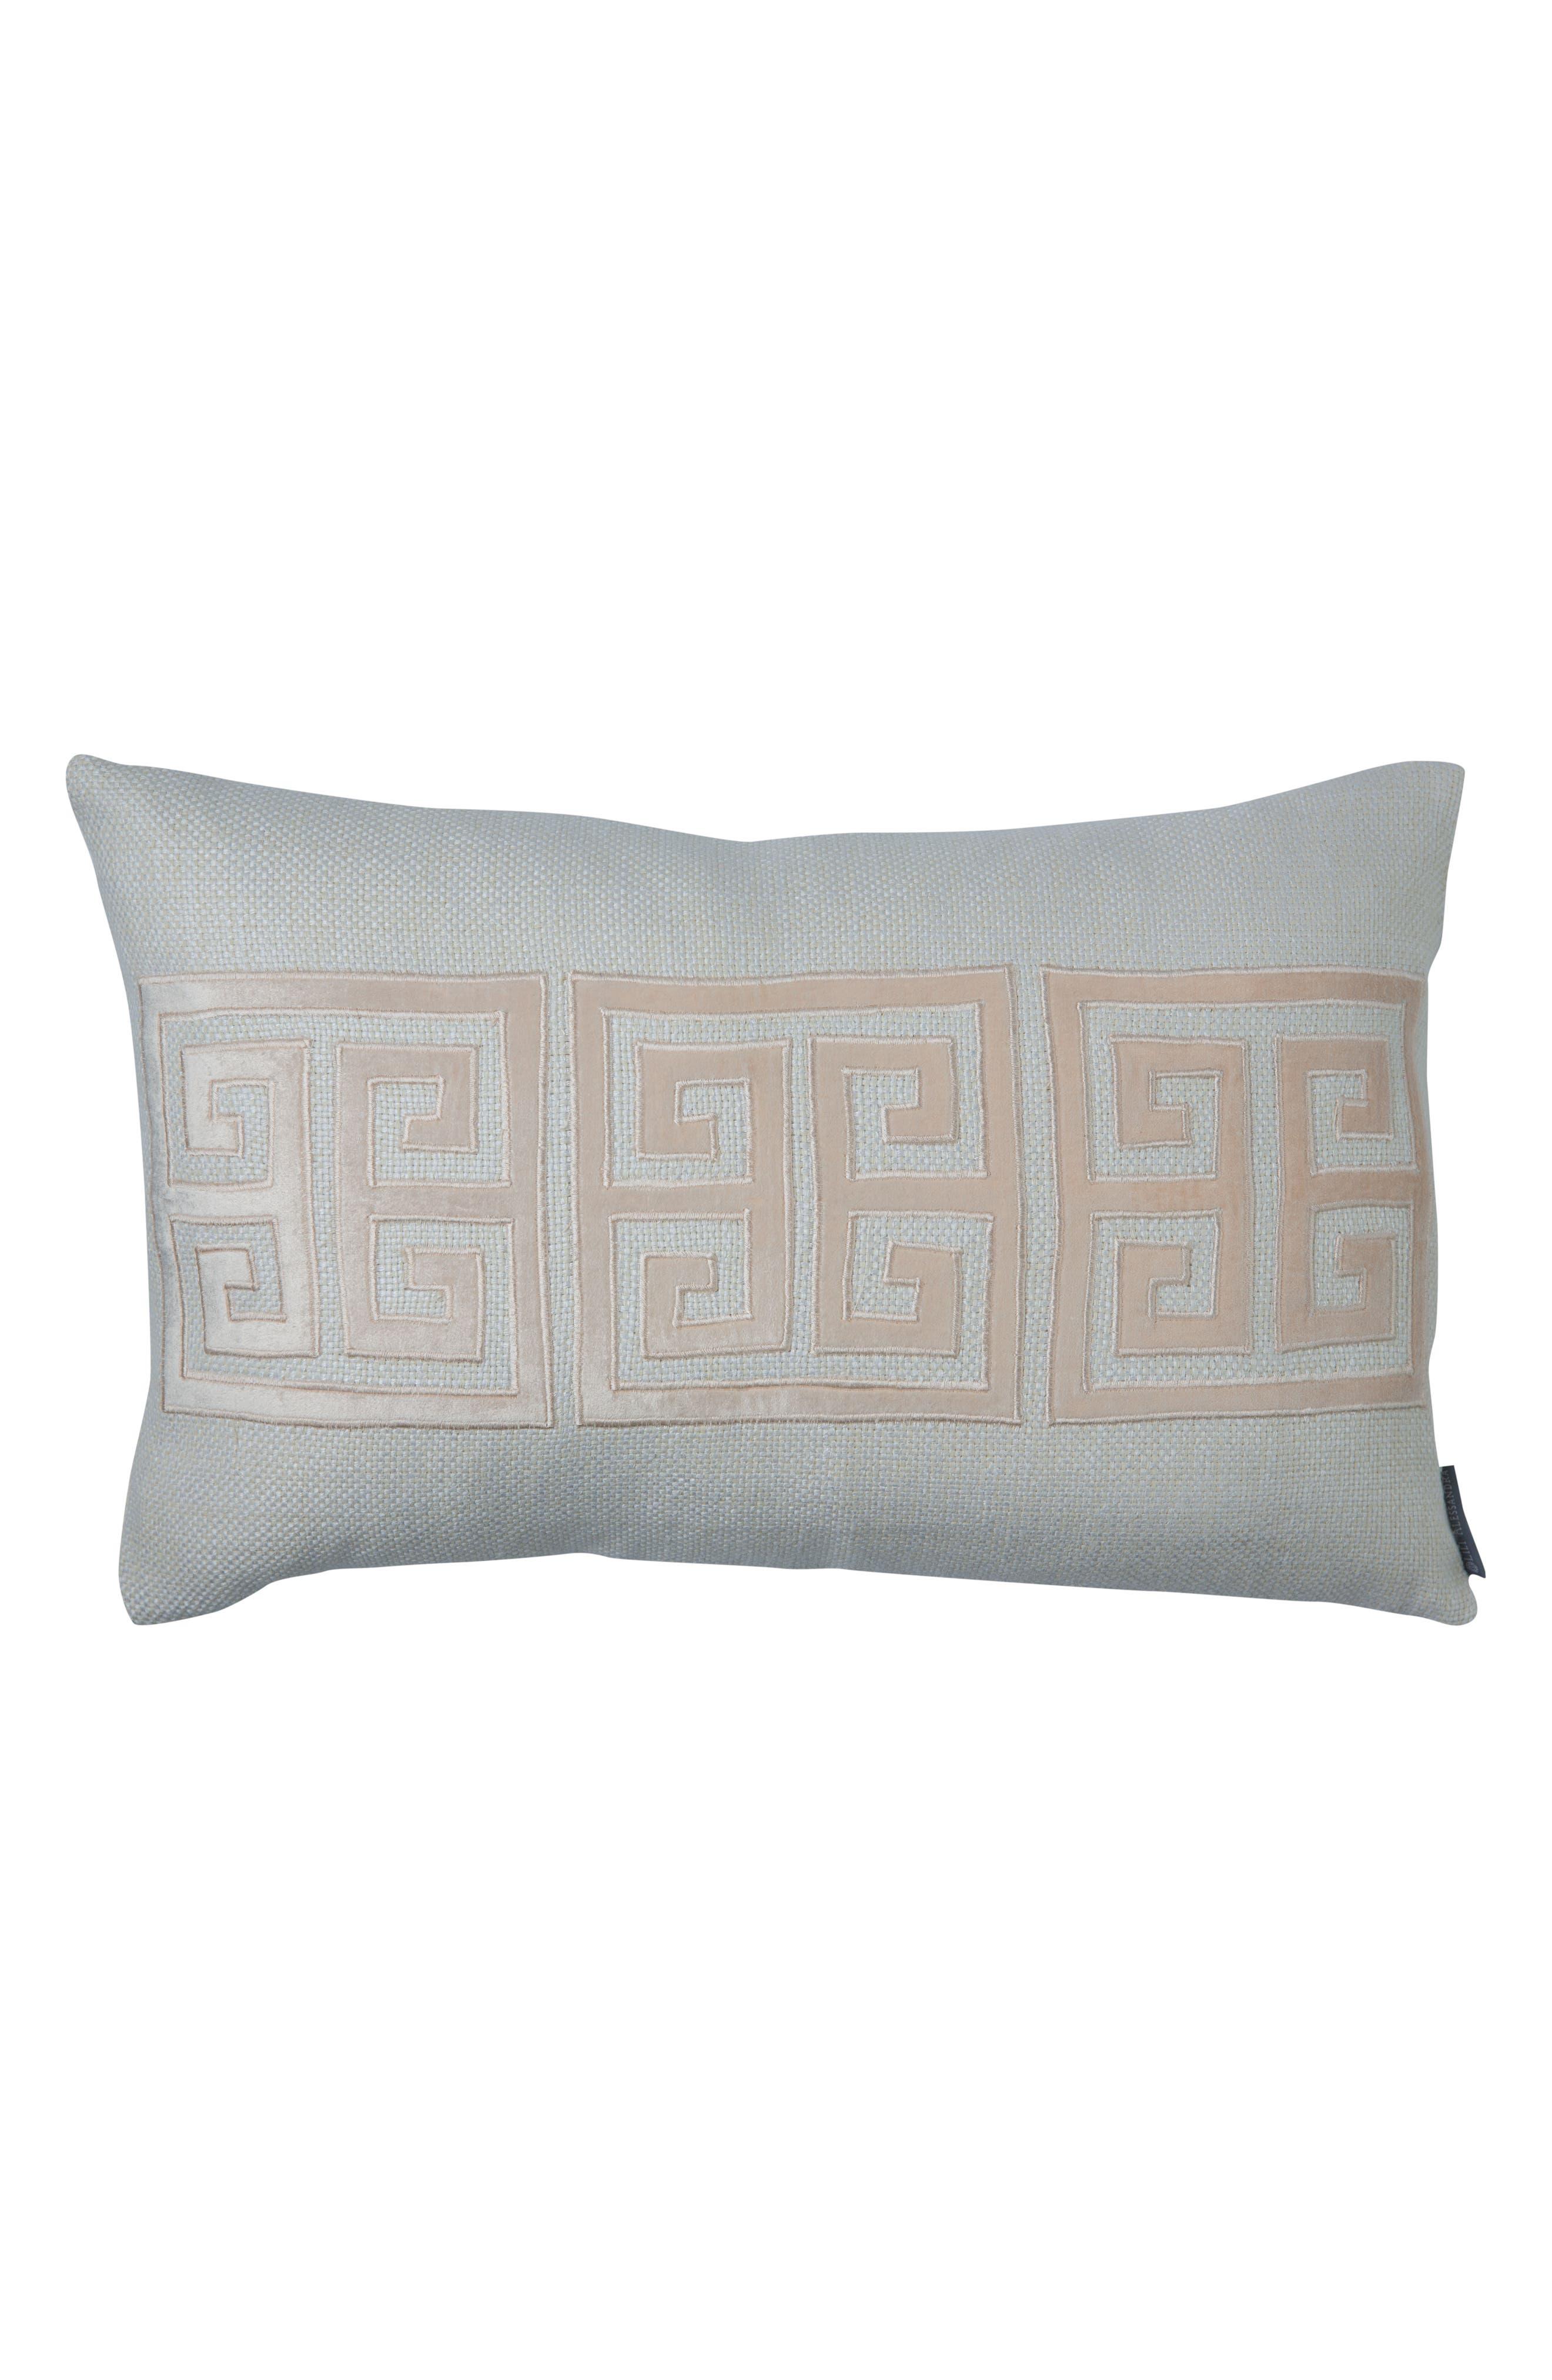 Guy Greek Key Accent Pillow,                             Main thumbnail 1, color,                             Pink